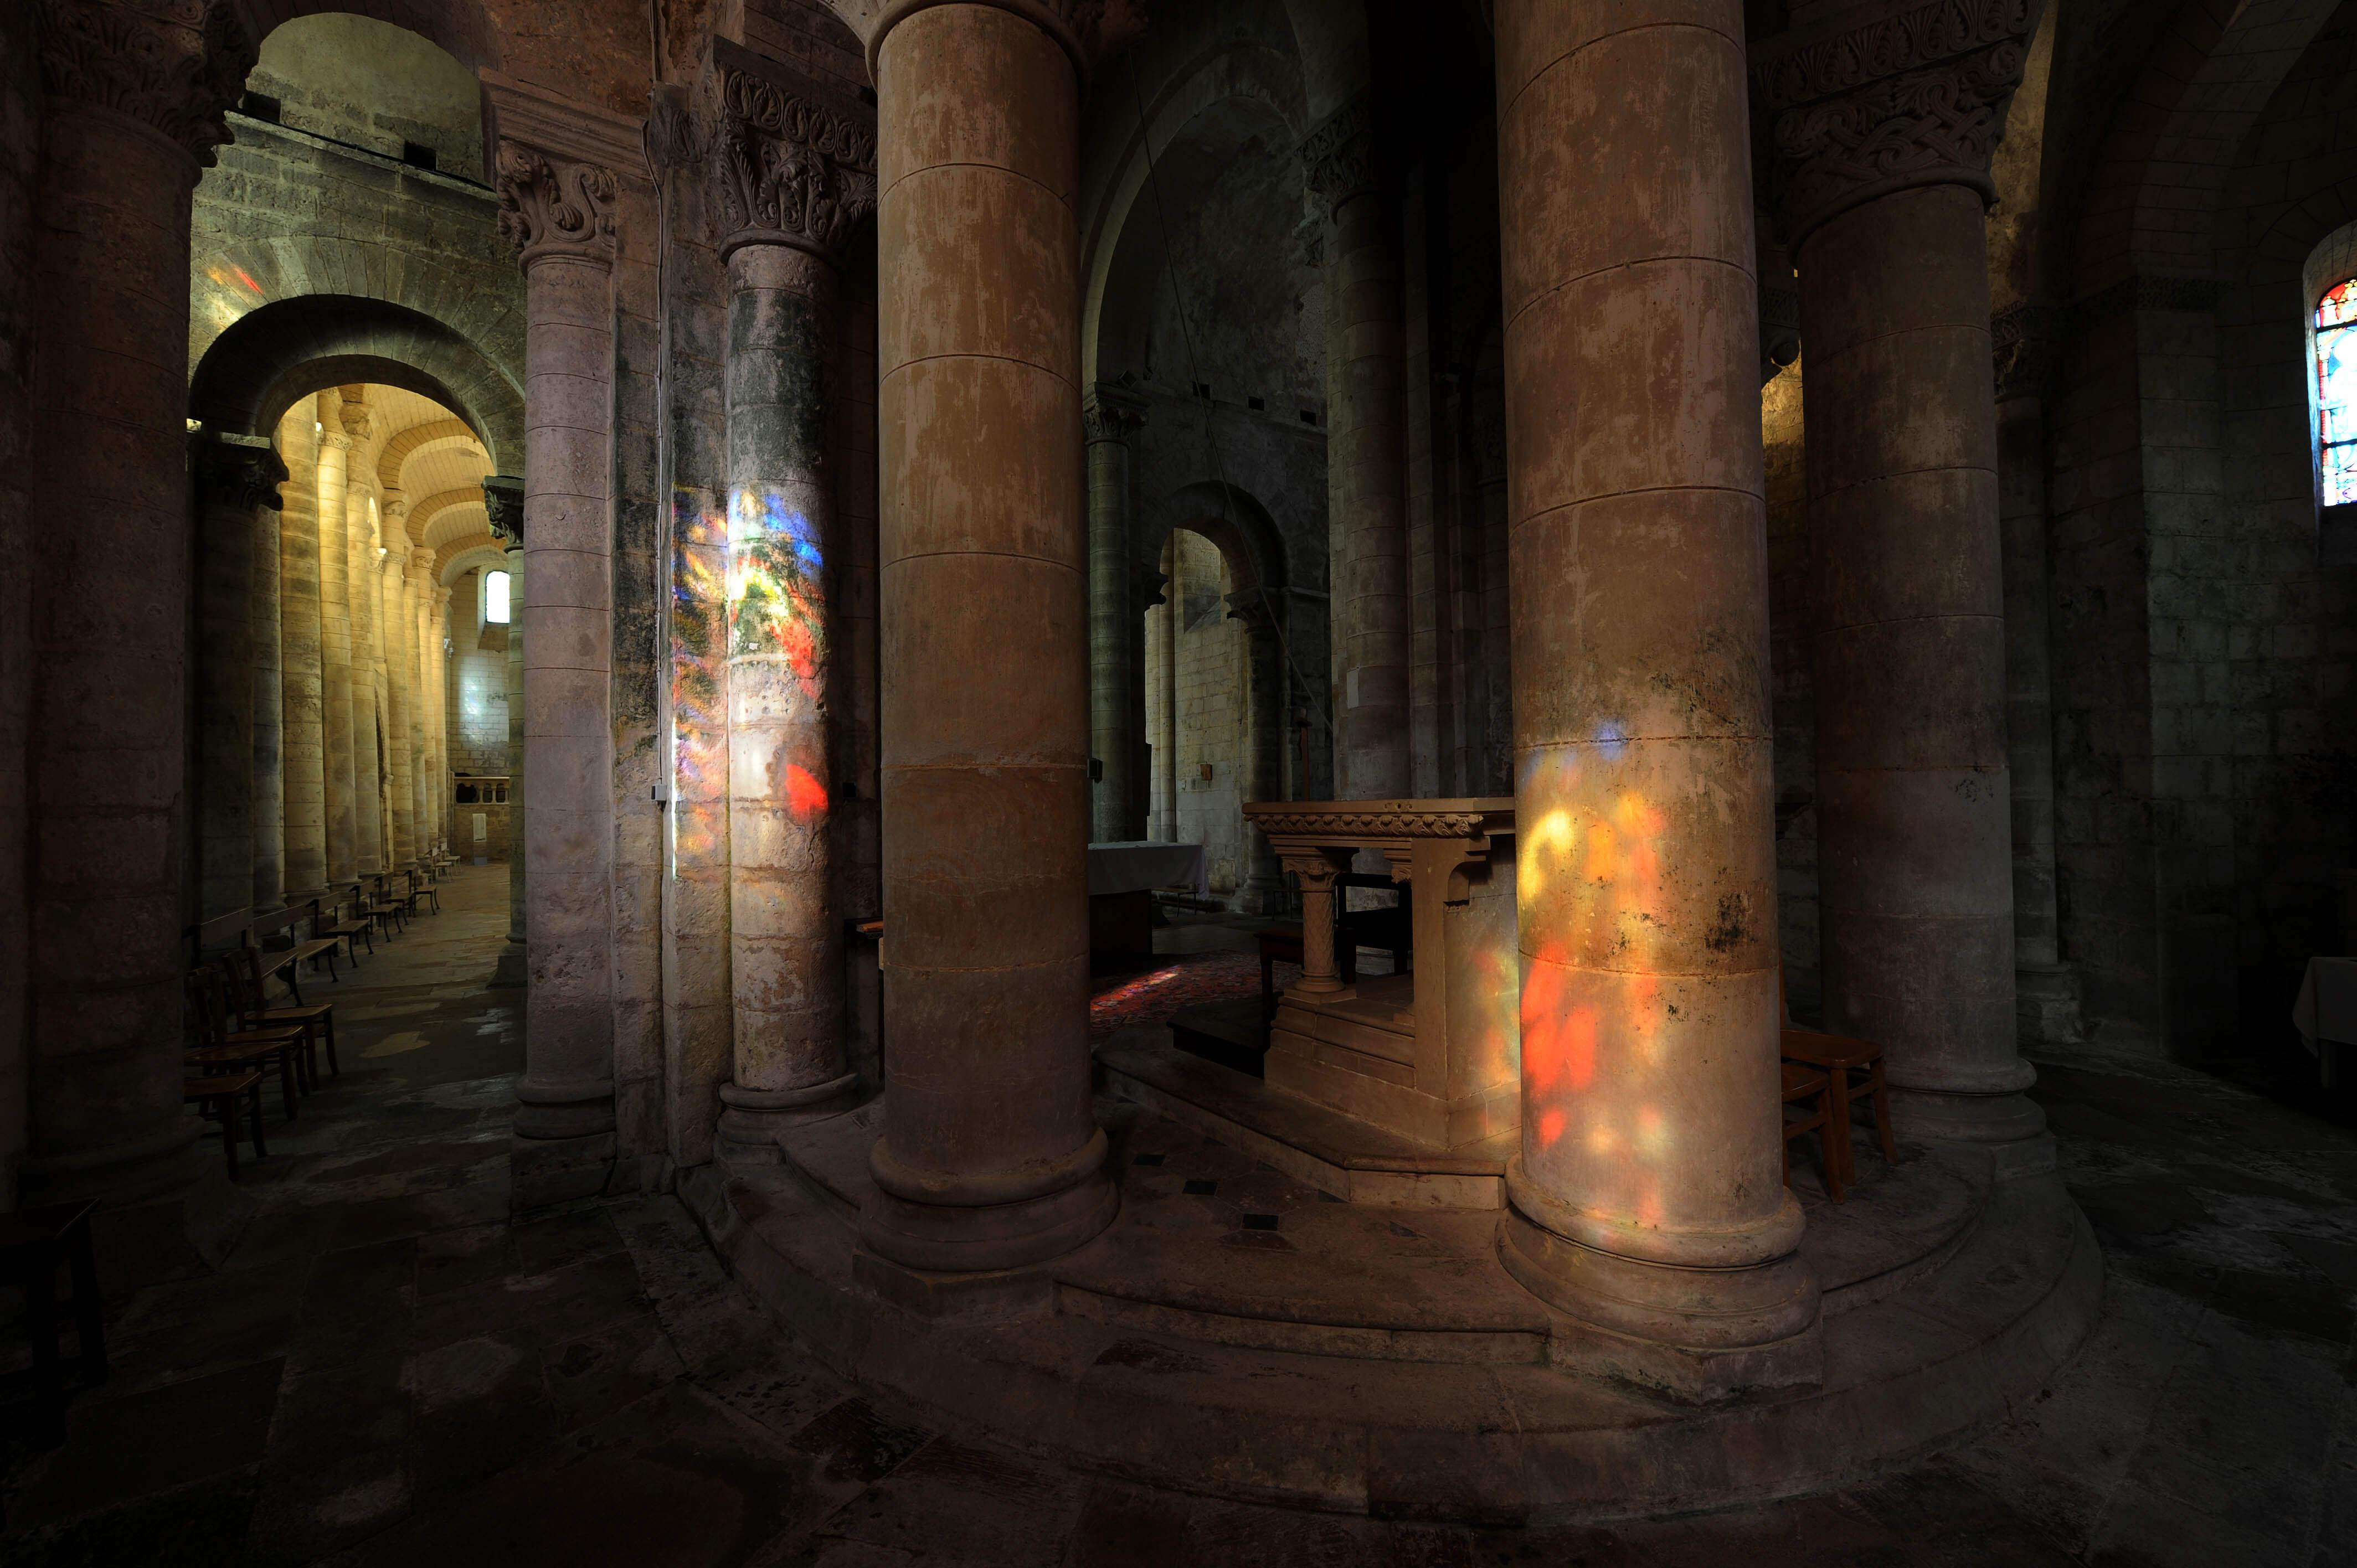 Eglise Saint-Hilaire©ACIR / JJ Gelbart